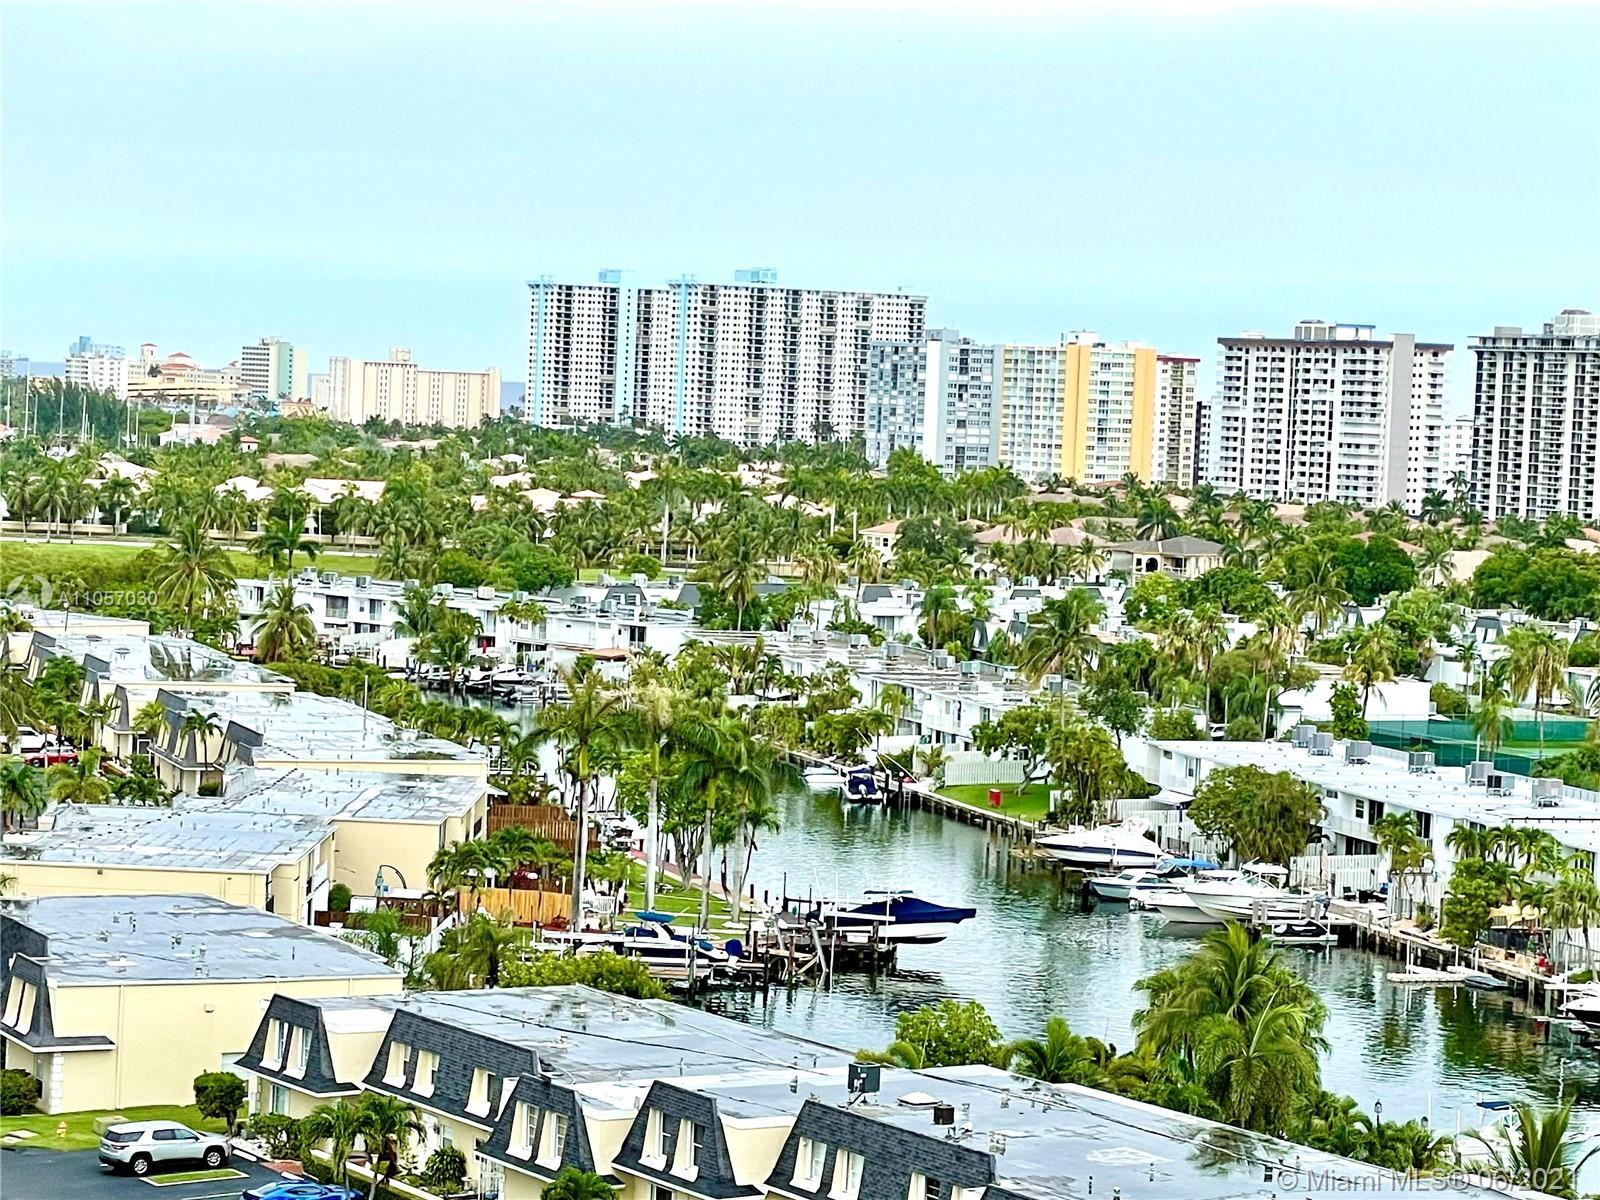 Olympus C #1212 - 2500 Parkview Dr #1212, Hallandale Beach, FL 33009